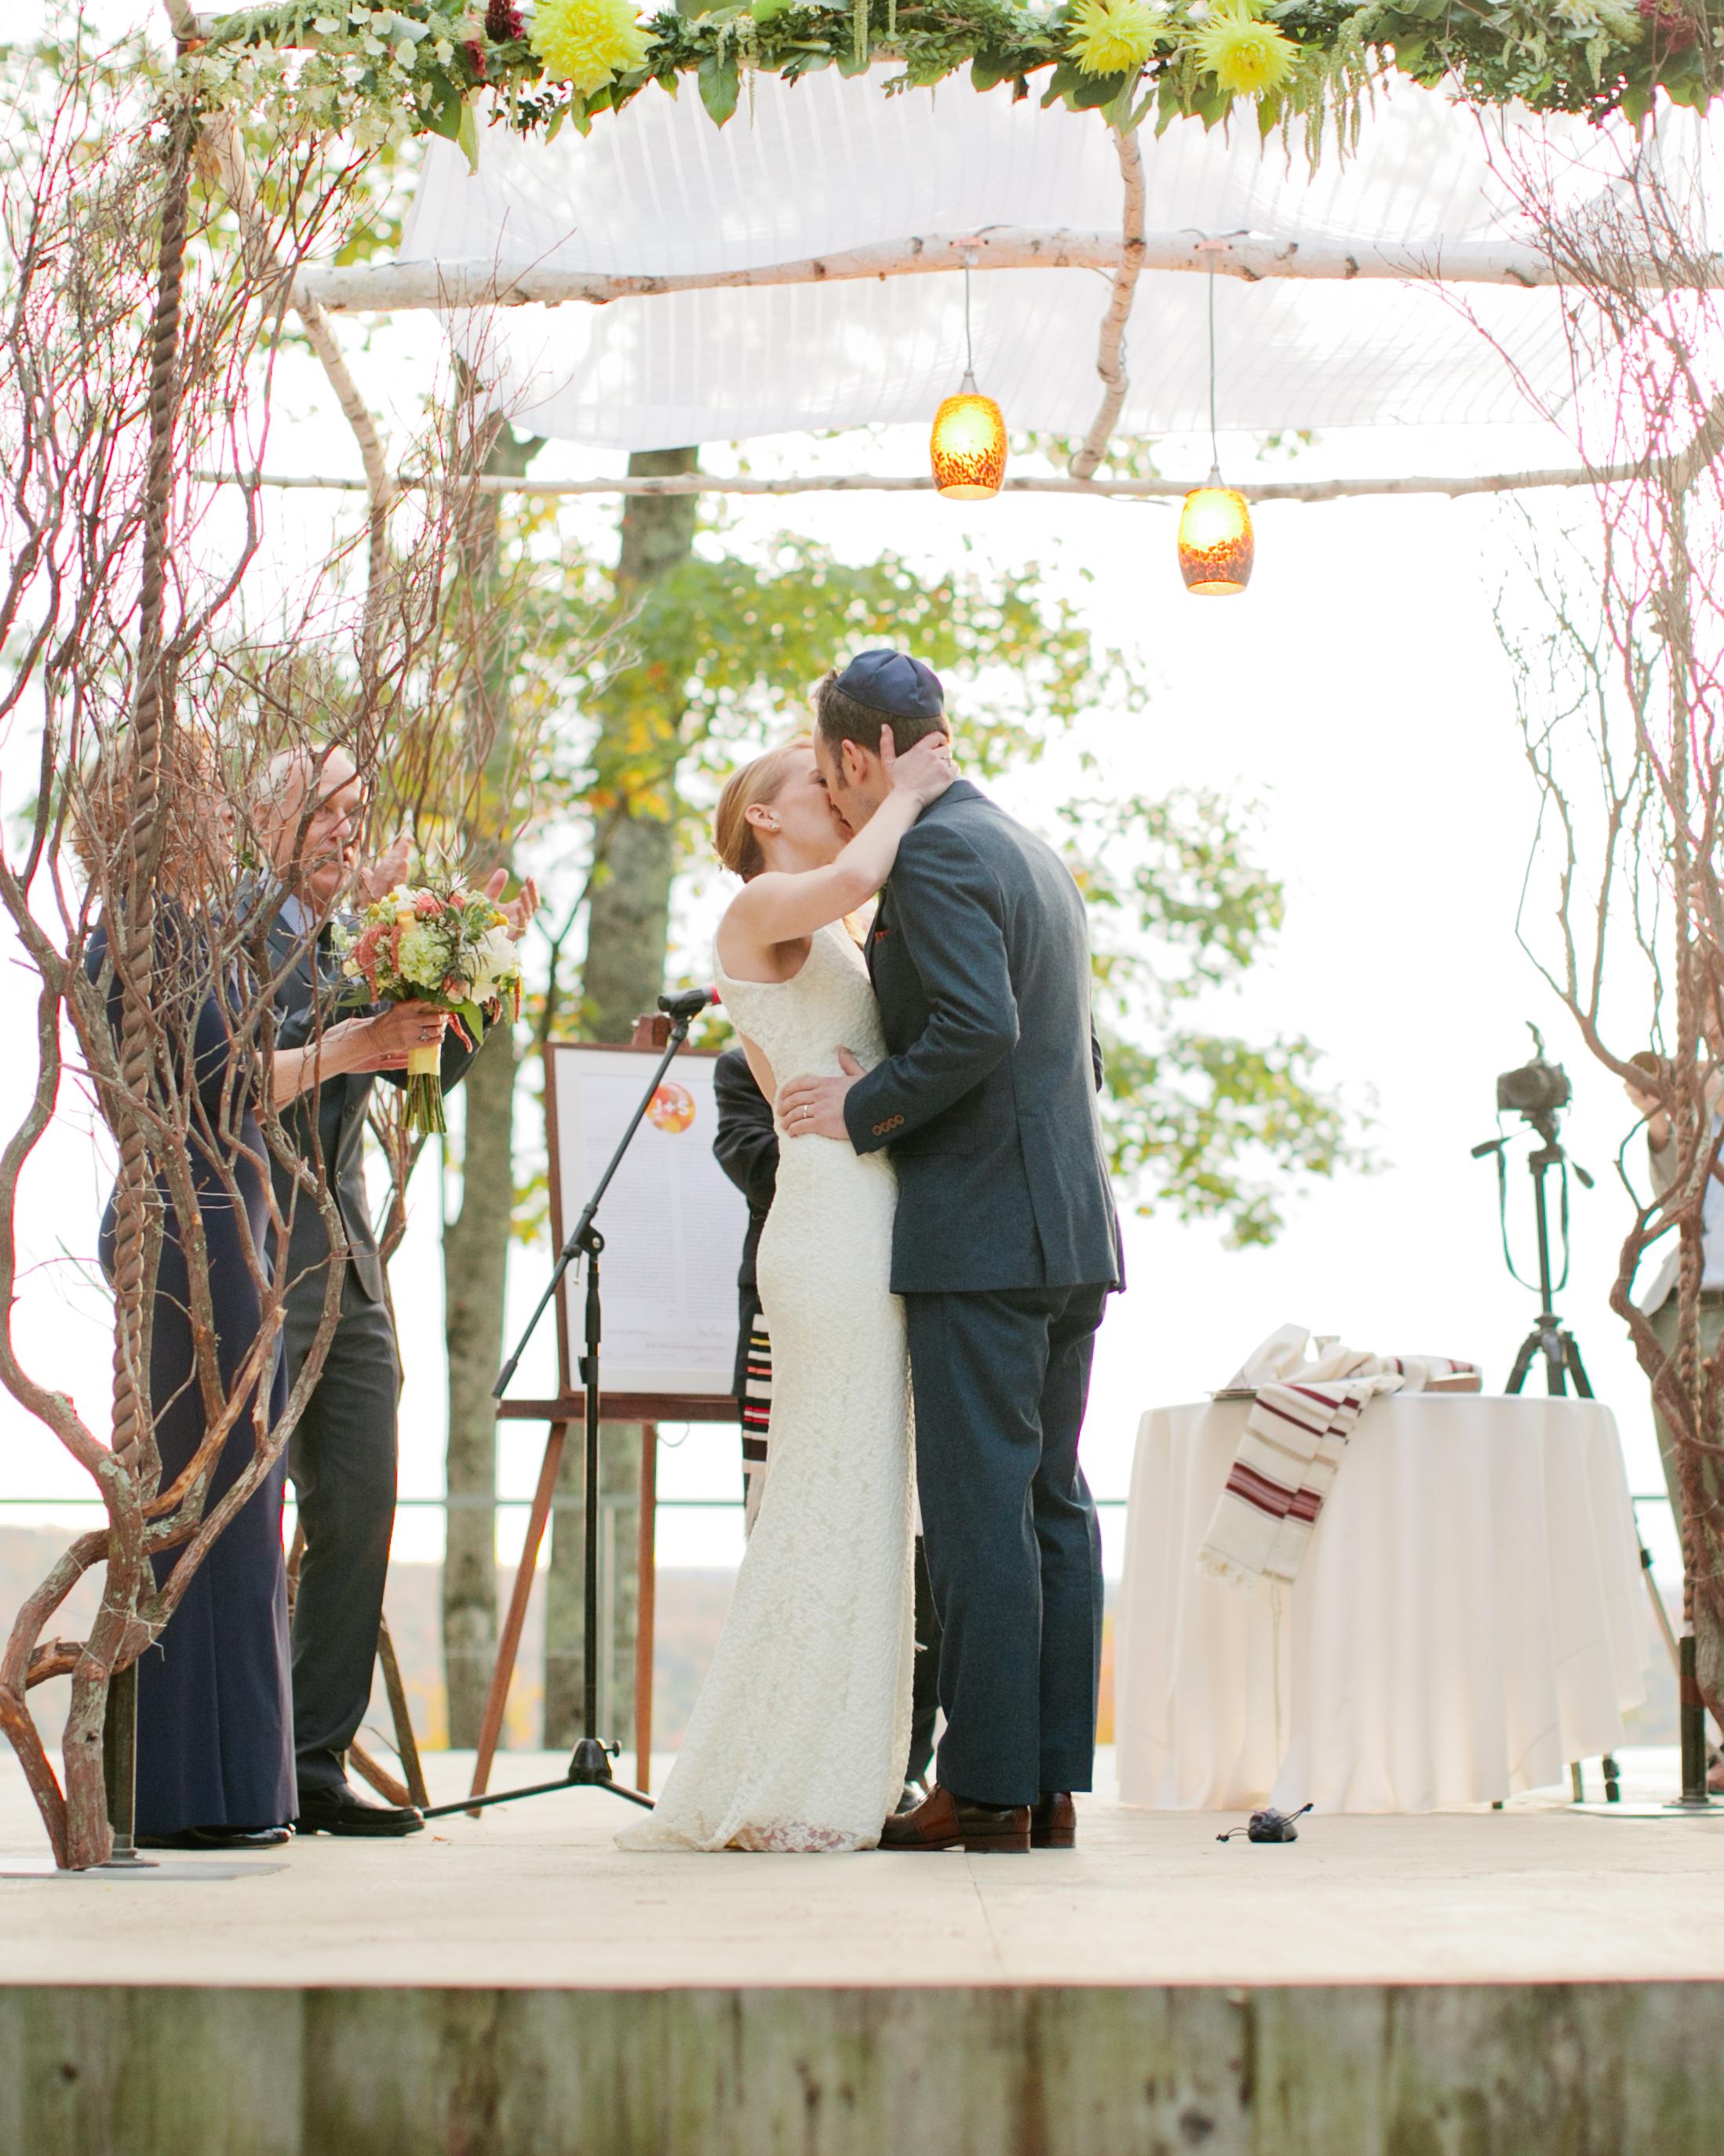 jess-steve-wedding-kiss-96-s112362-1115.jpg